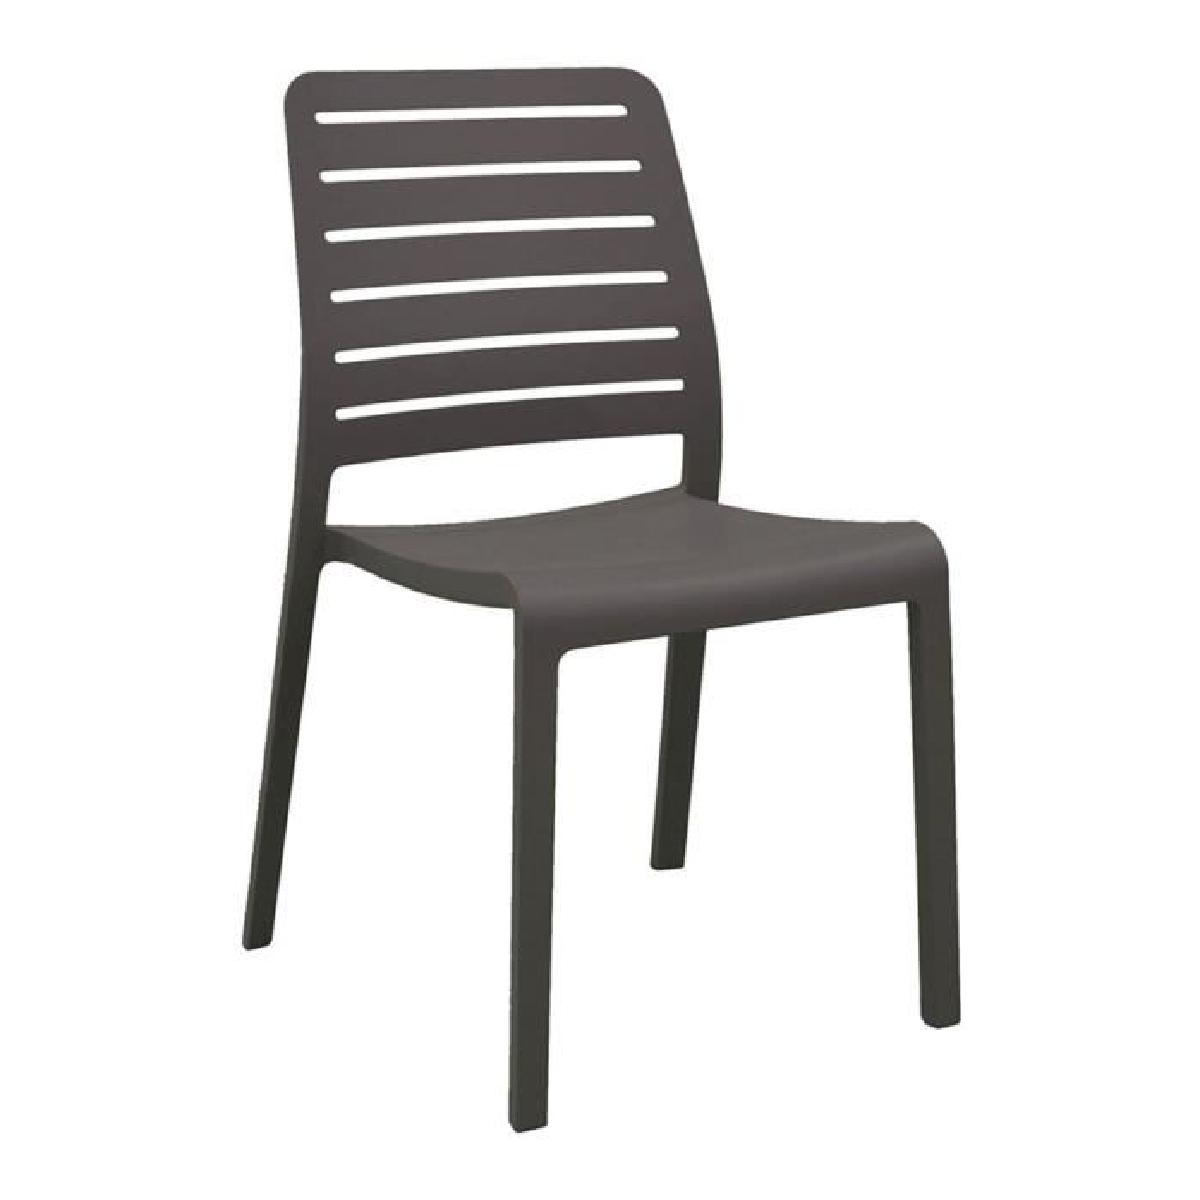 chaise de jardin empilable grise chaweng veranda. Black Bedroom Furniture Sets. Home Design Ideas